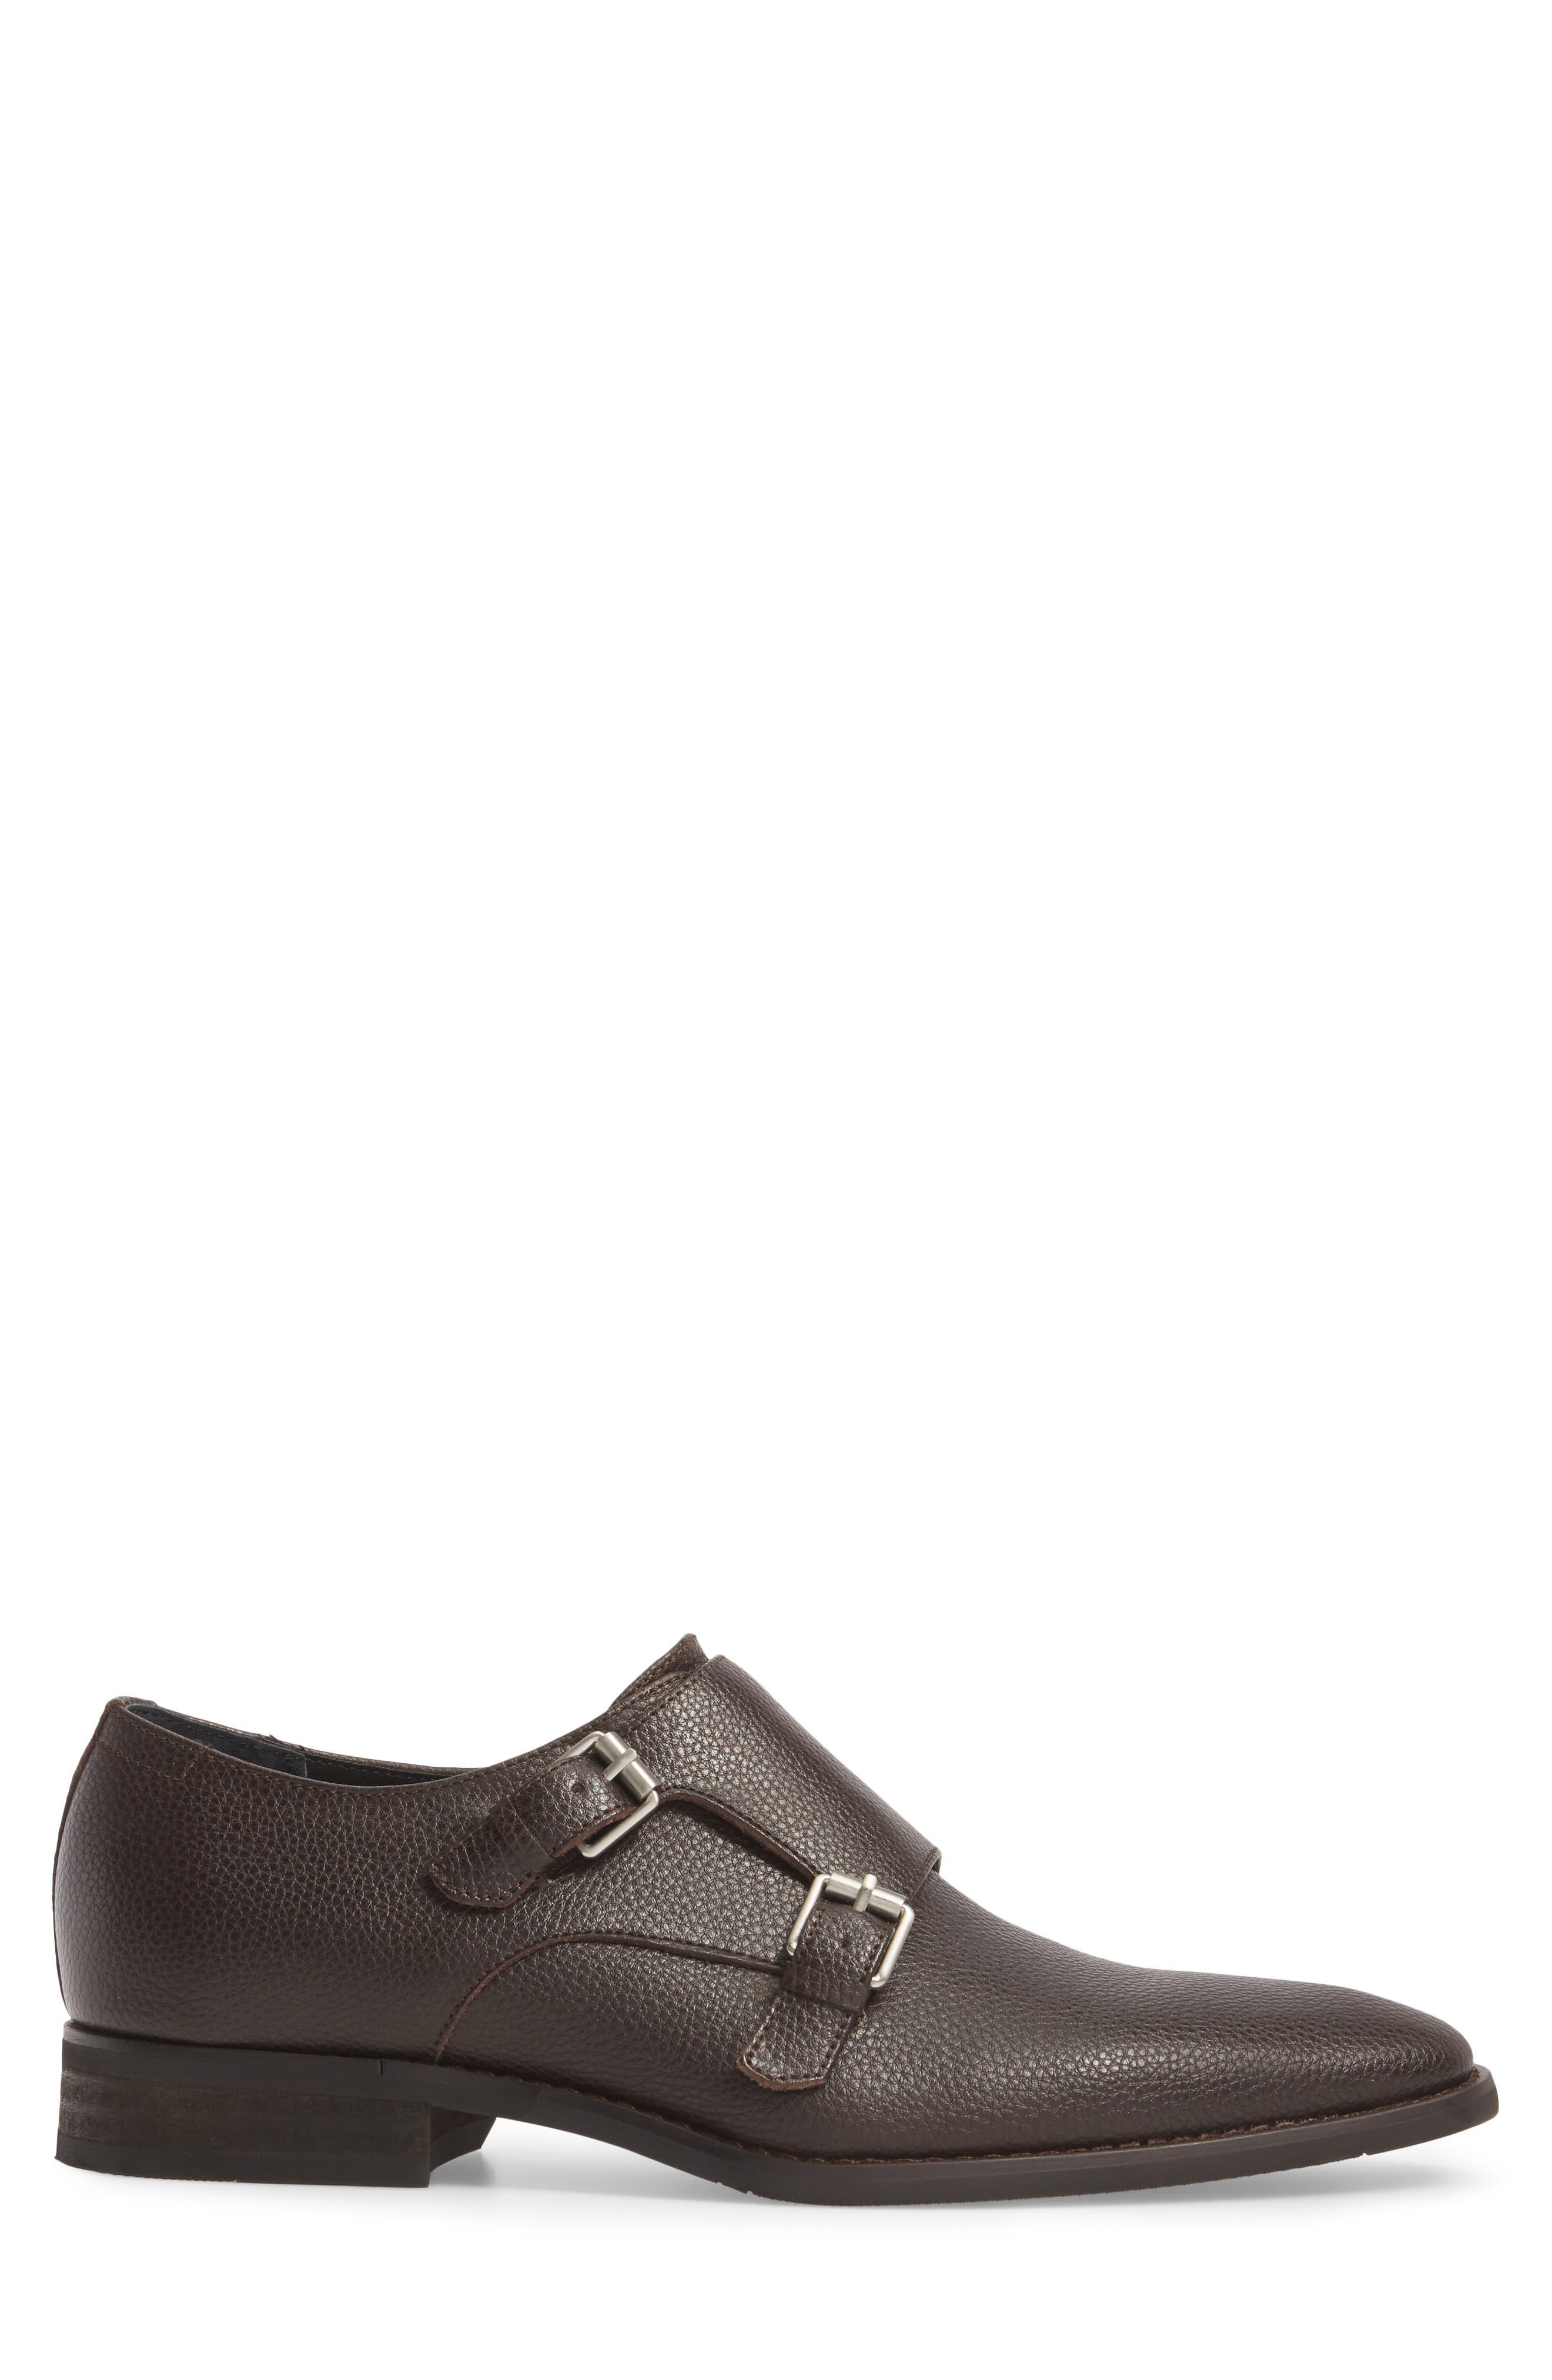 Robbie Double Monk Strap Shoe,                             Alternate thumbnail 3, color,                             Dark Brown Leather